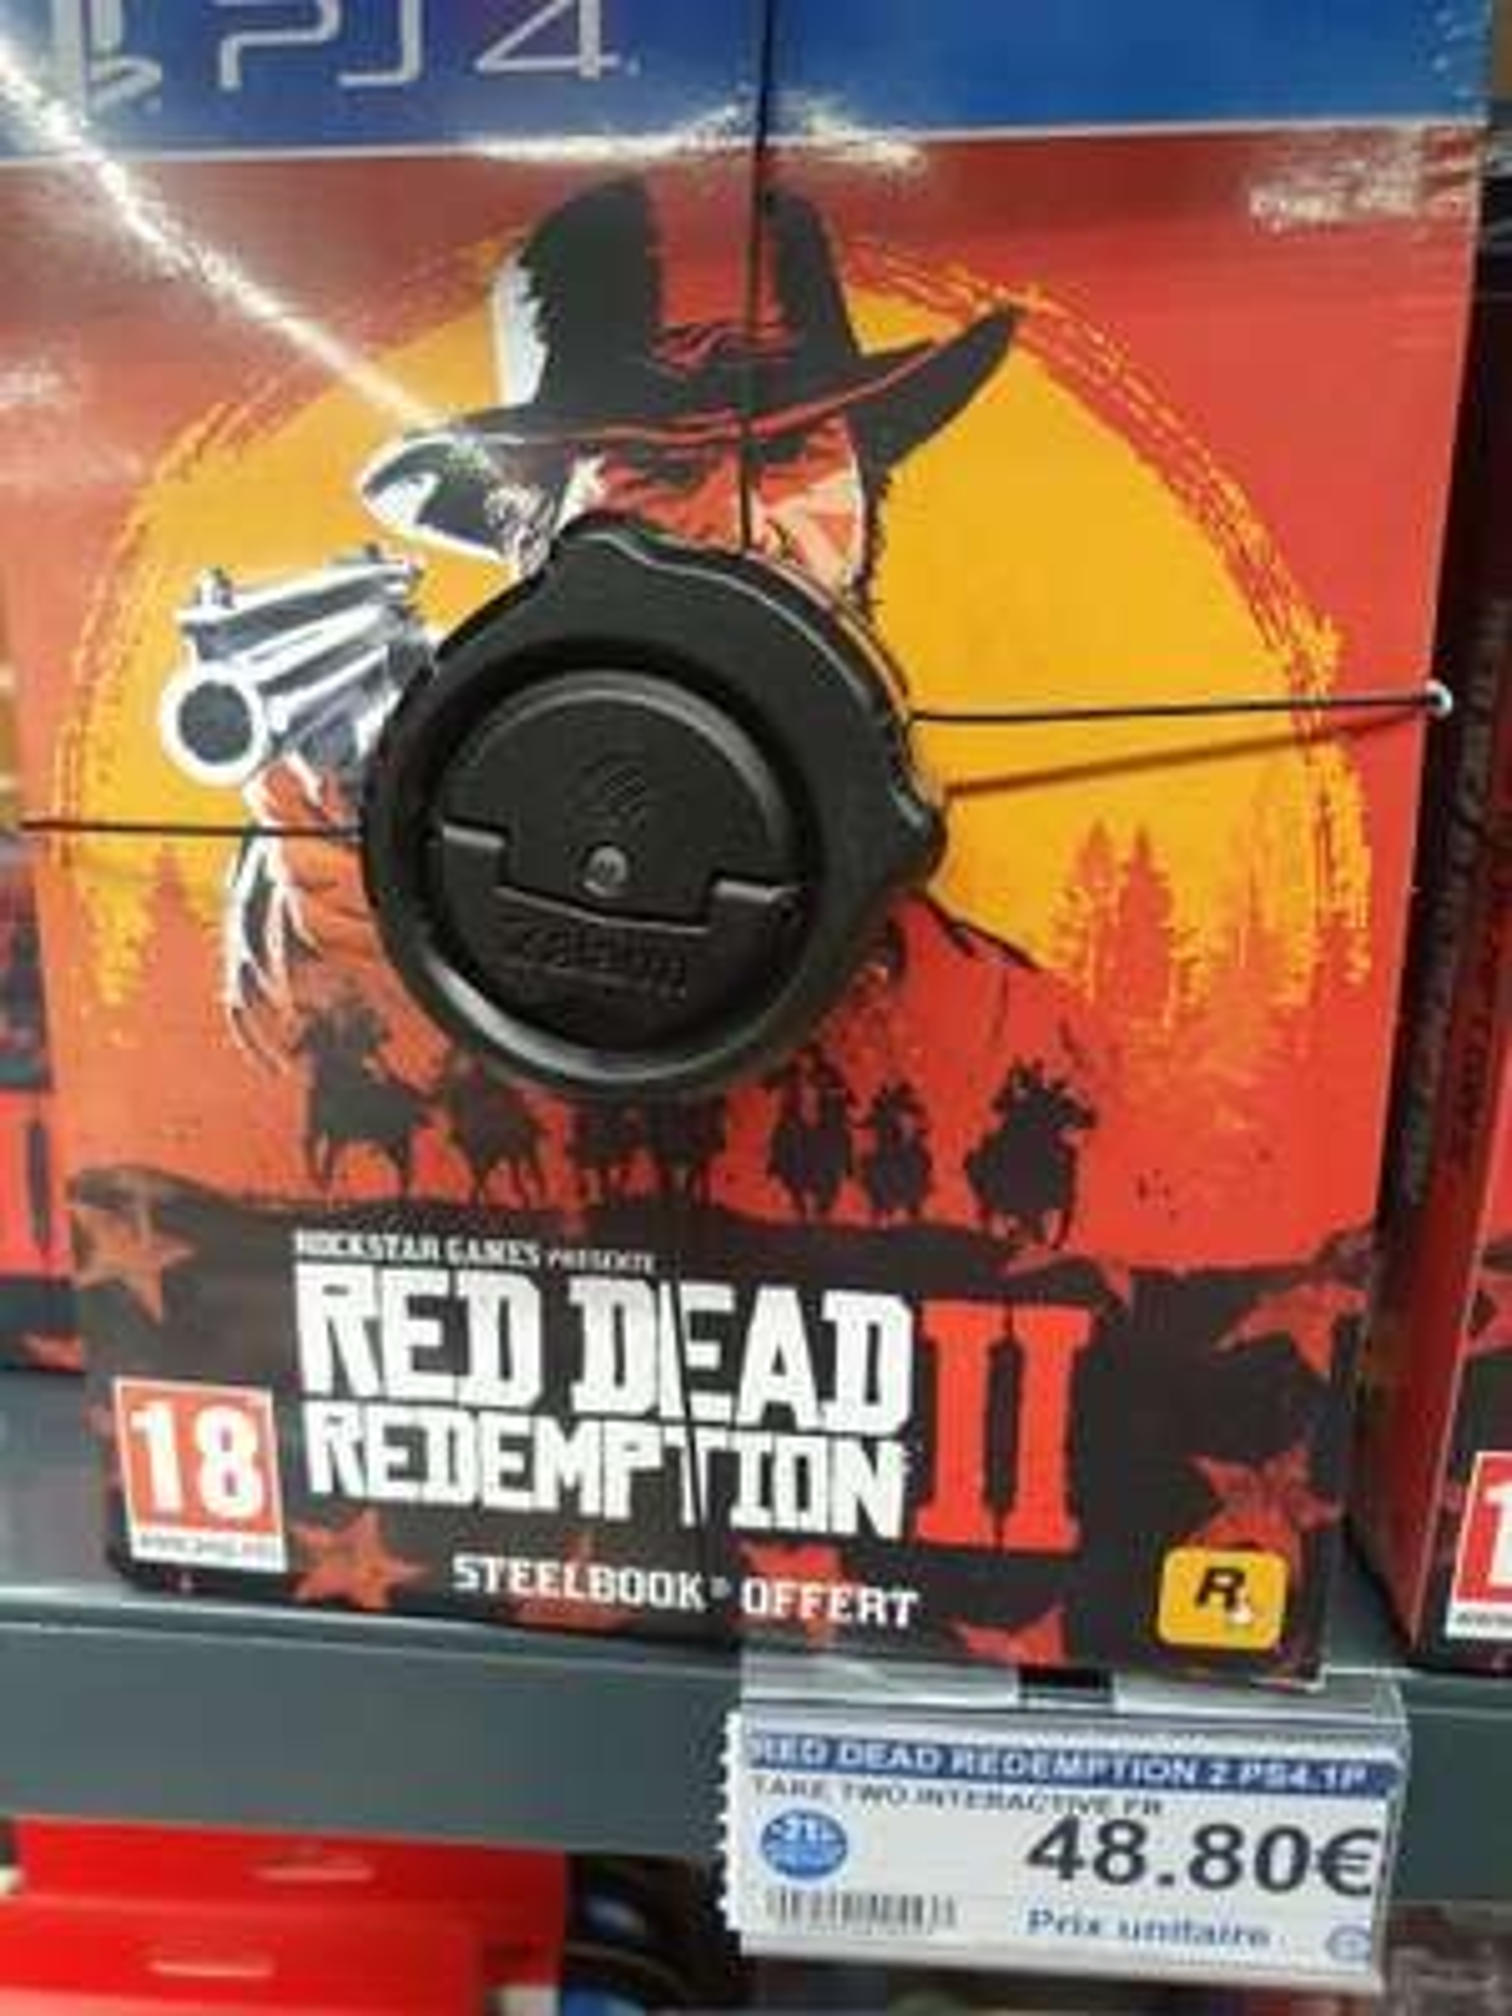 Red Dead Redemption 2 (avec steelbook) - Orvault (44)